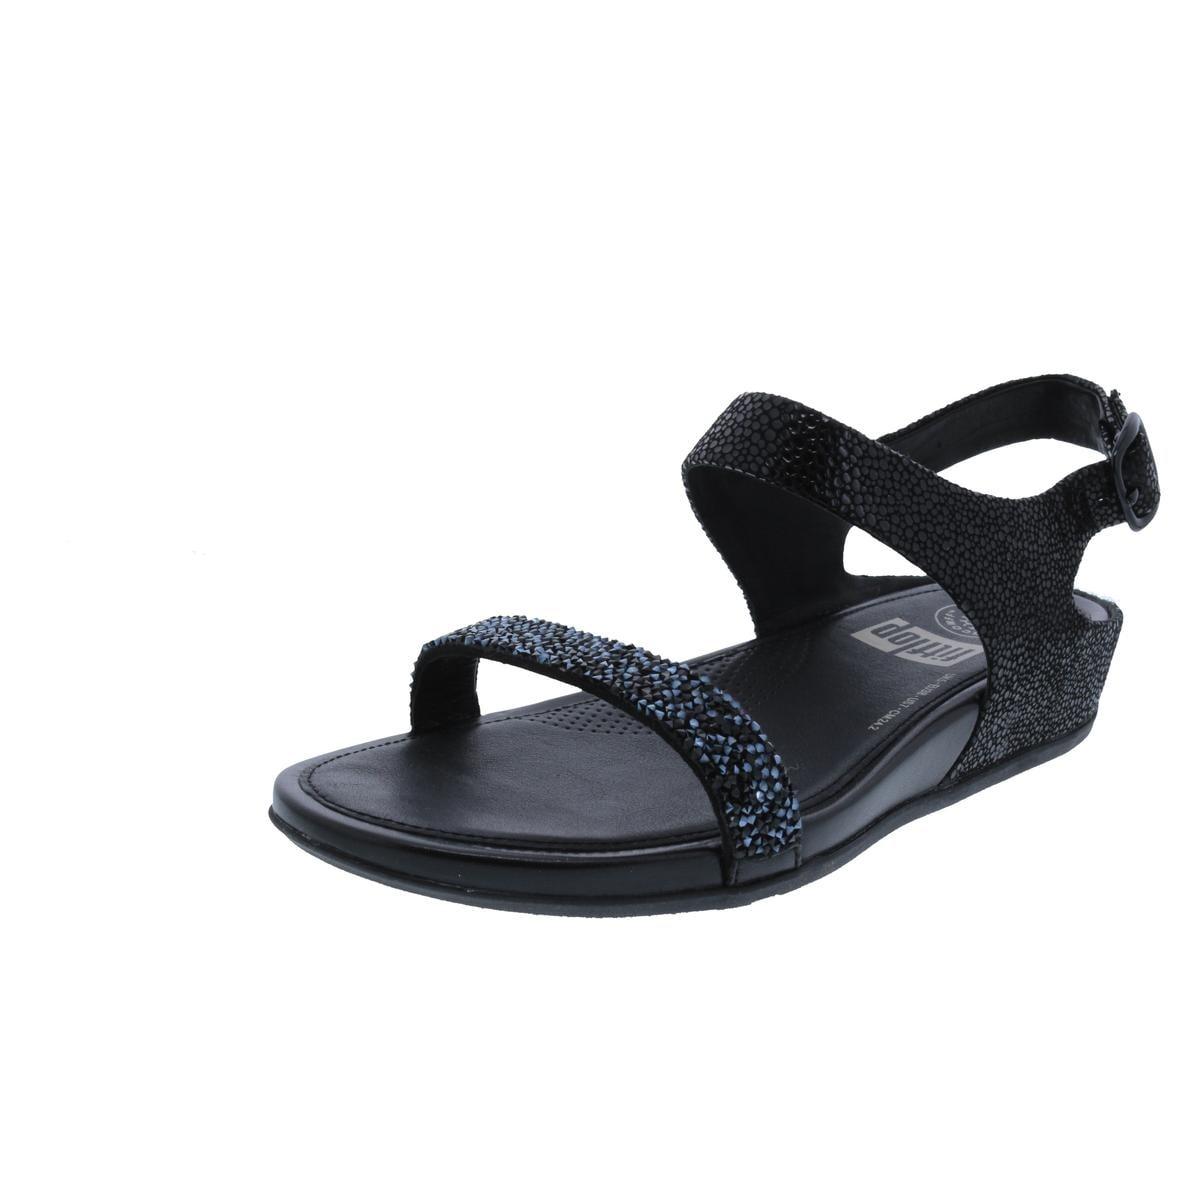 05e86e40a Fitflop Womens Banda Roxy Wedge Sandals Open Toe Embellished - 7 medium  (b